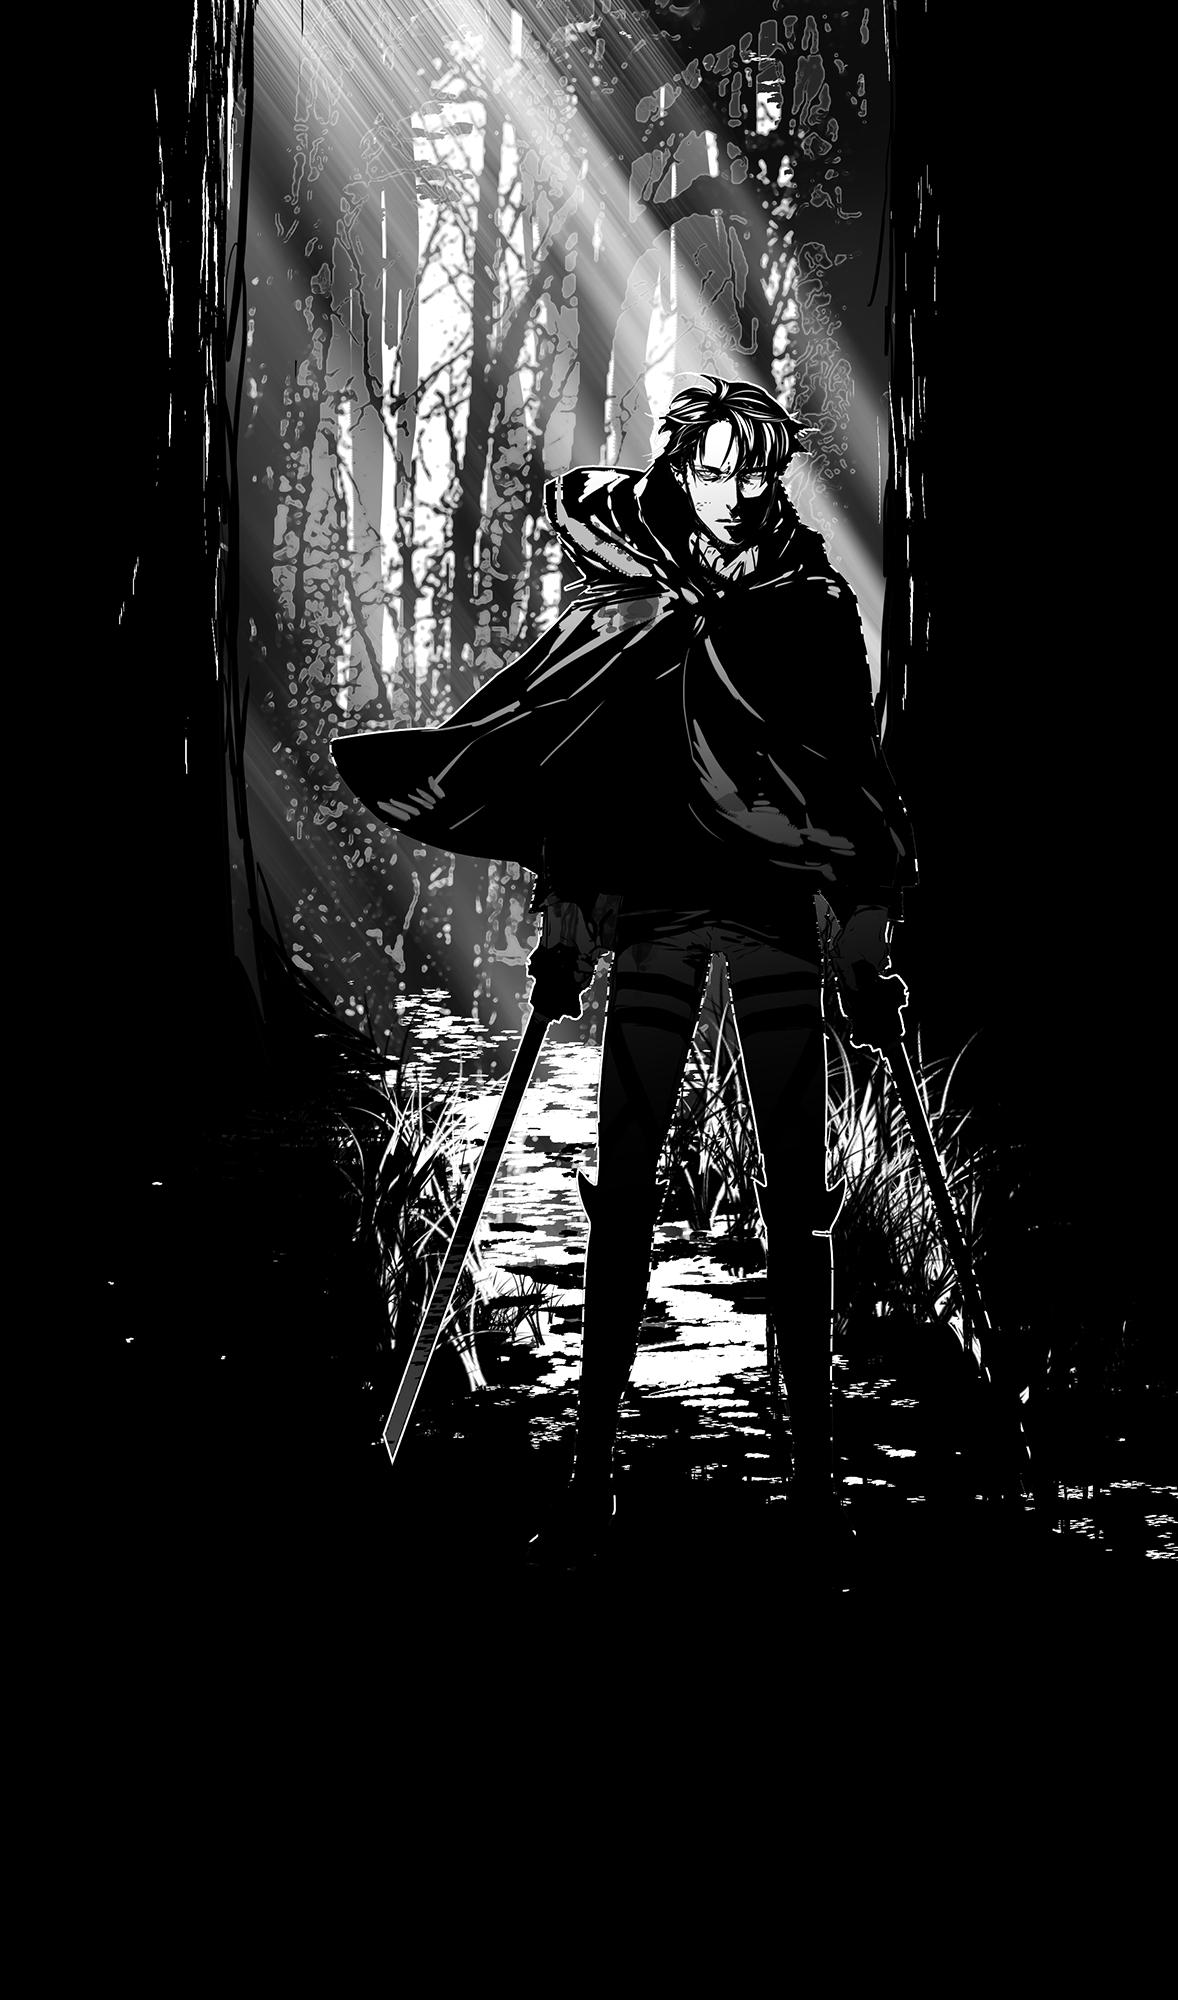 Levi Ackerman Attack On Titan Mobile Wallpaper 1609443 Zerochan Anime Image Board